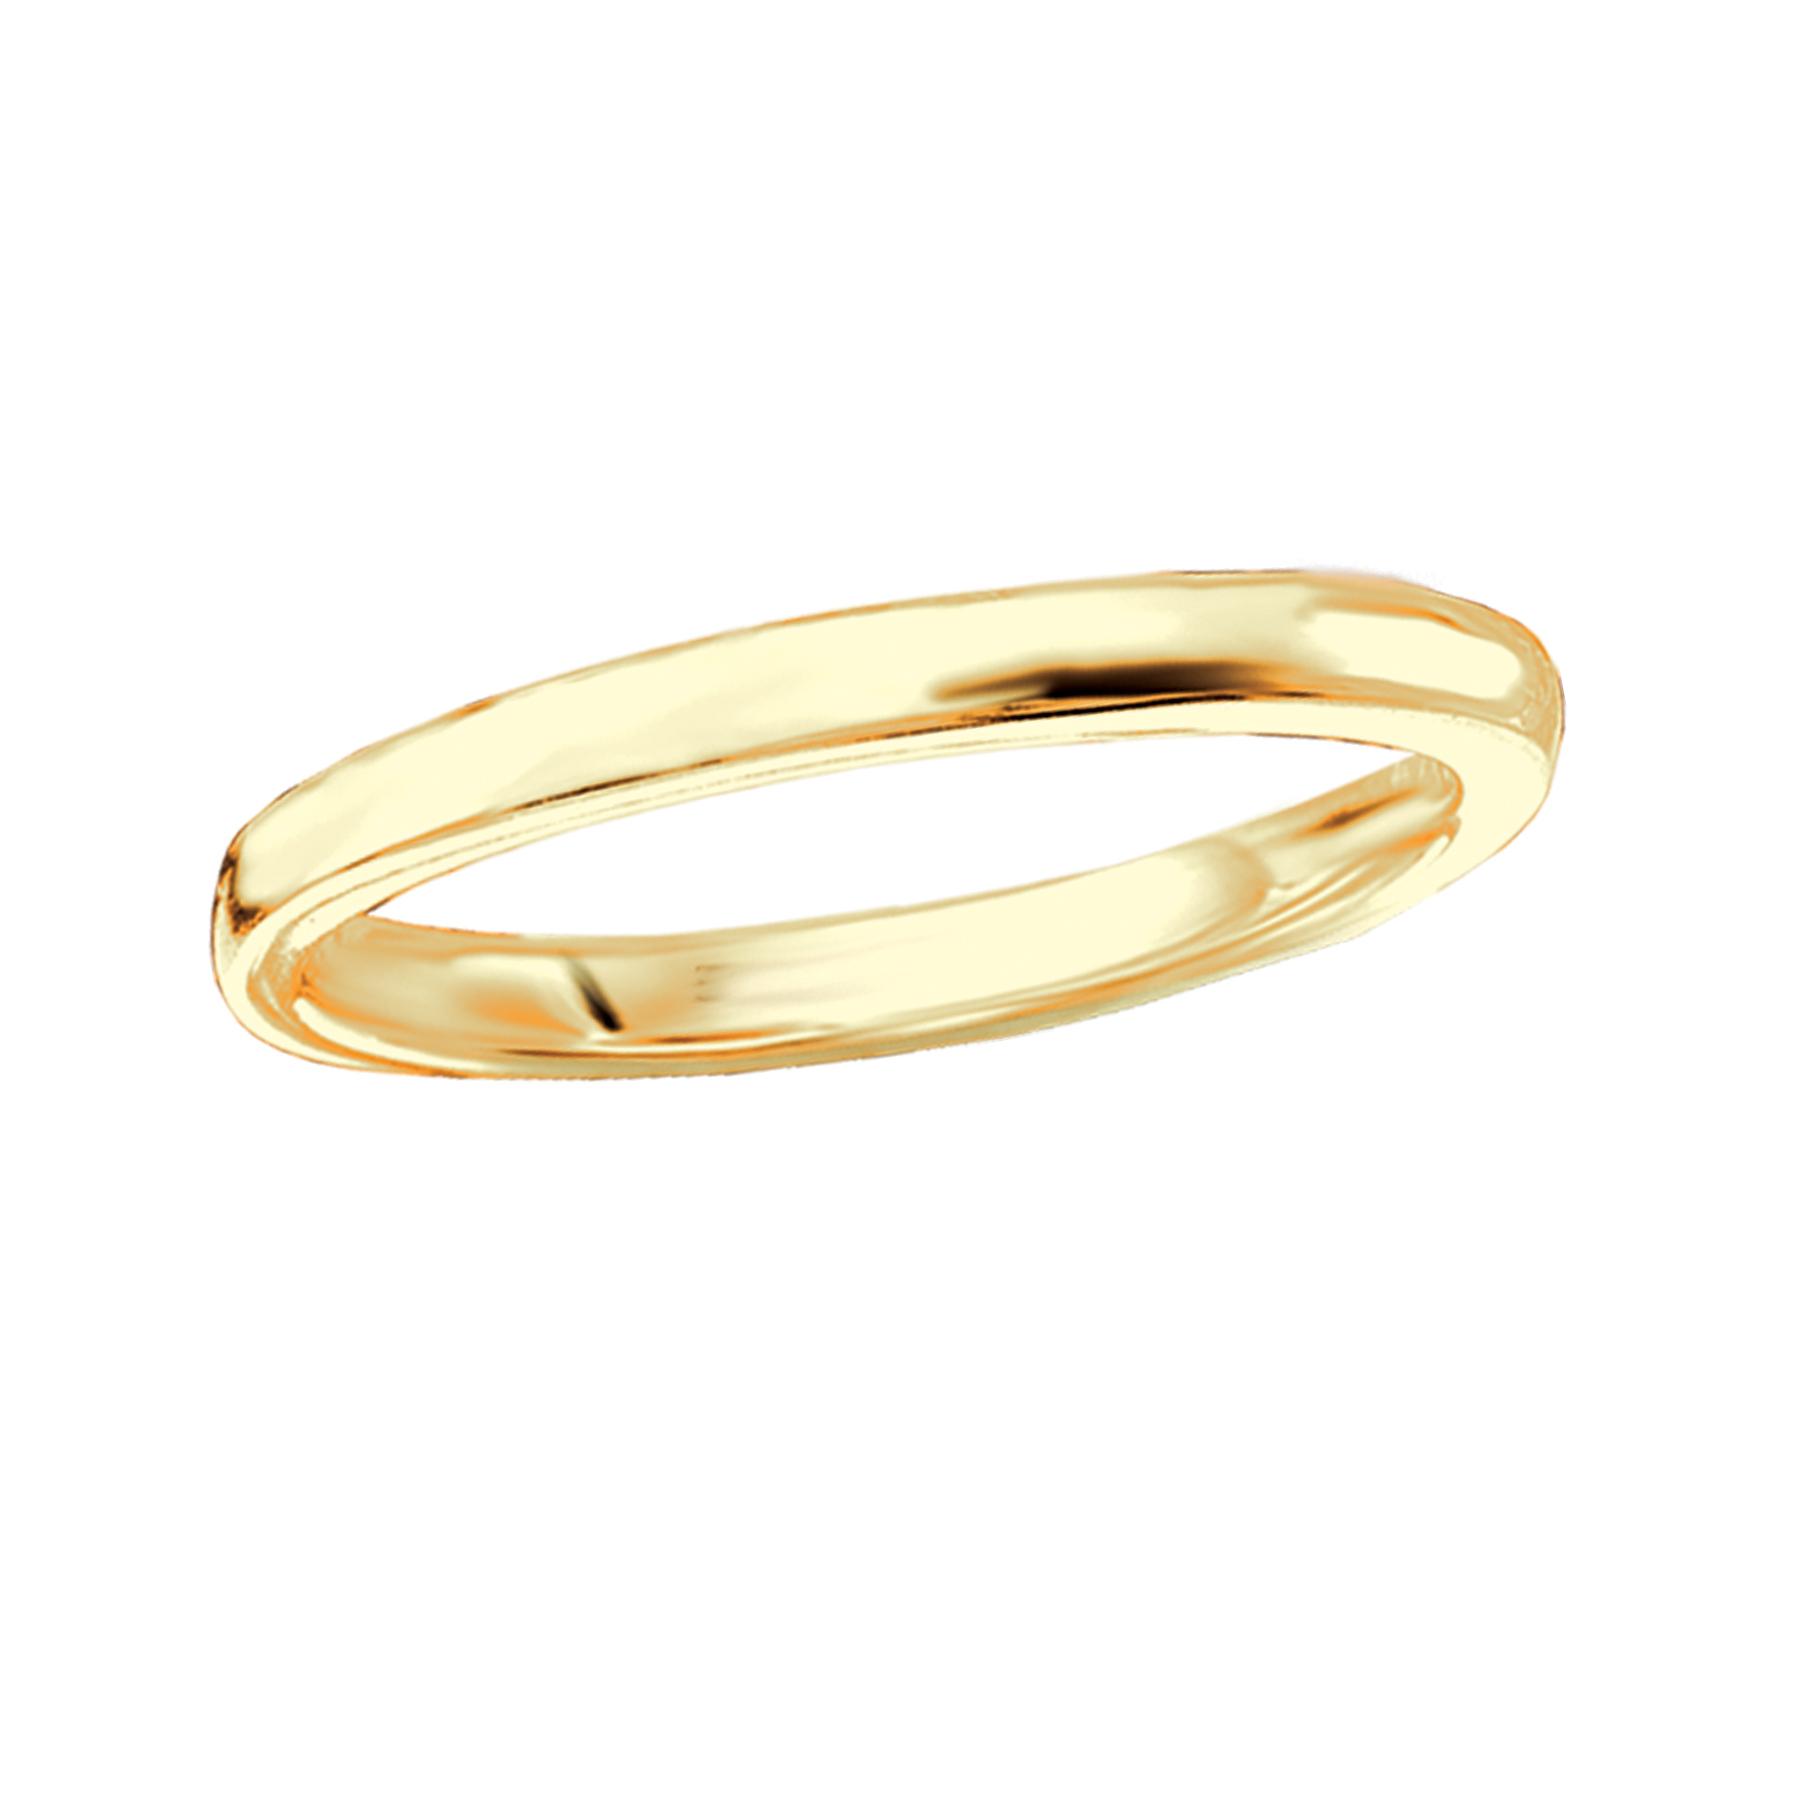 Romantic Bands: Romance Wedding Bands 117124-Y